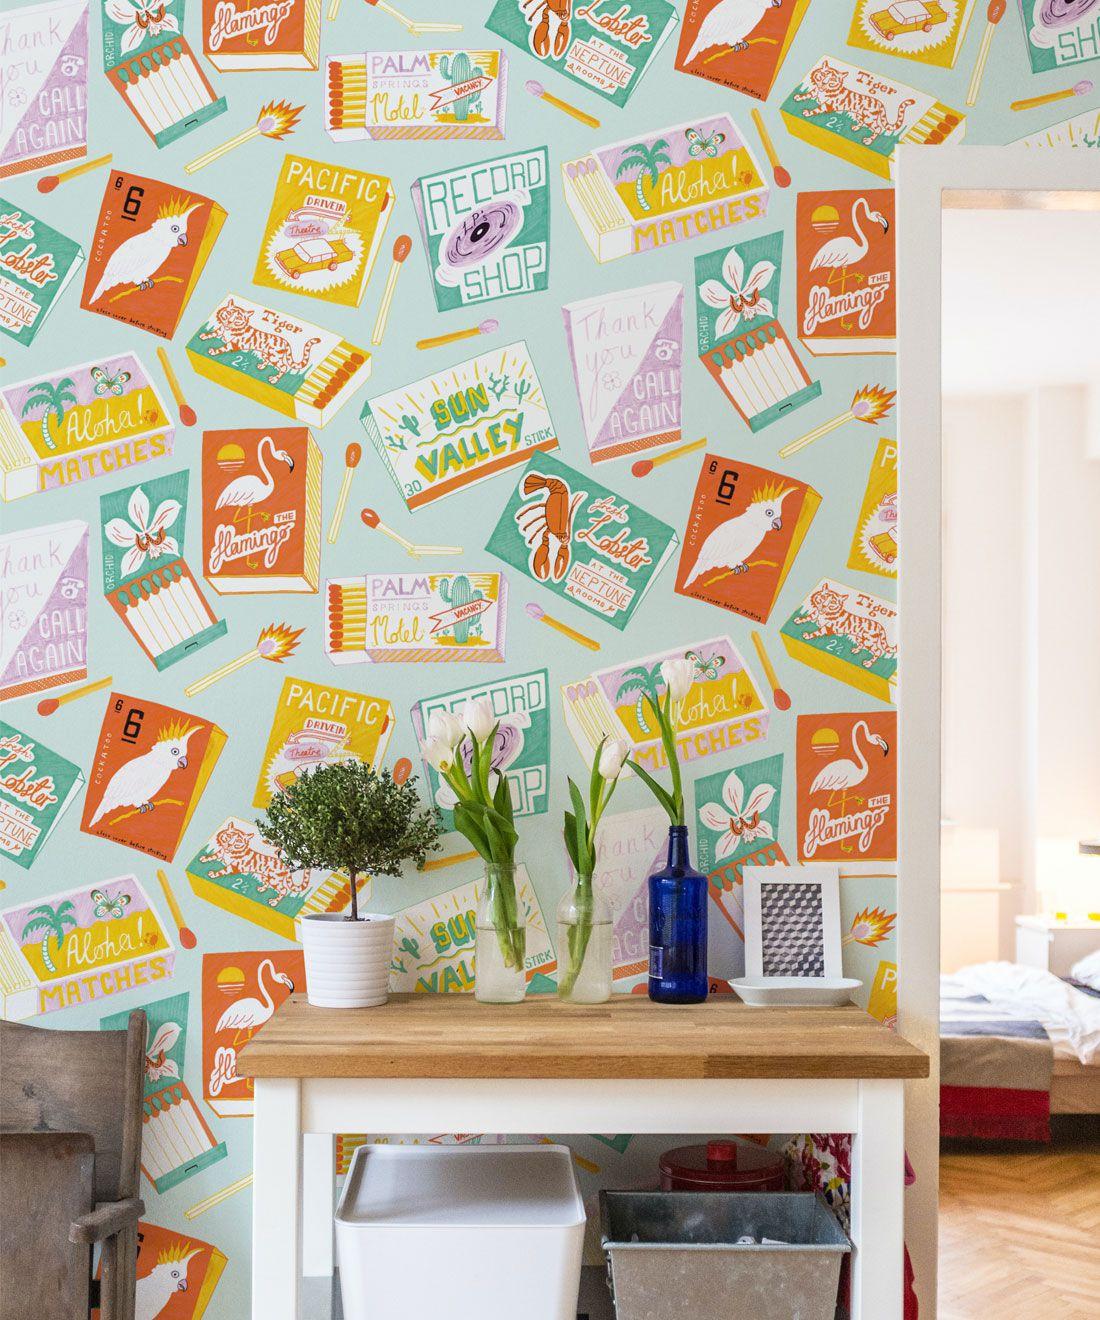 Match Books Wallpaper • retro wallpaper • las vegas style • gaming wallpaper • smokers wallpaper • fire insitu